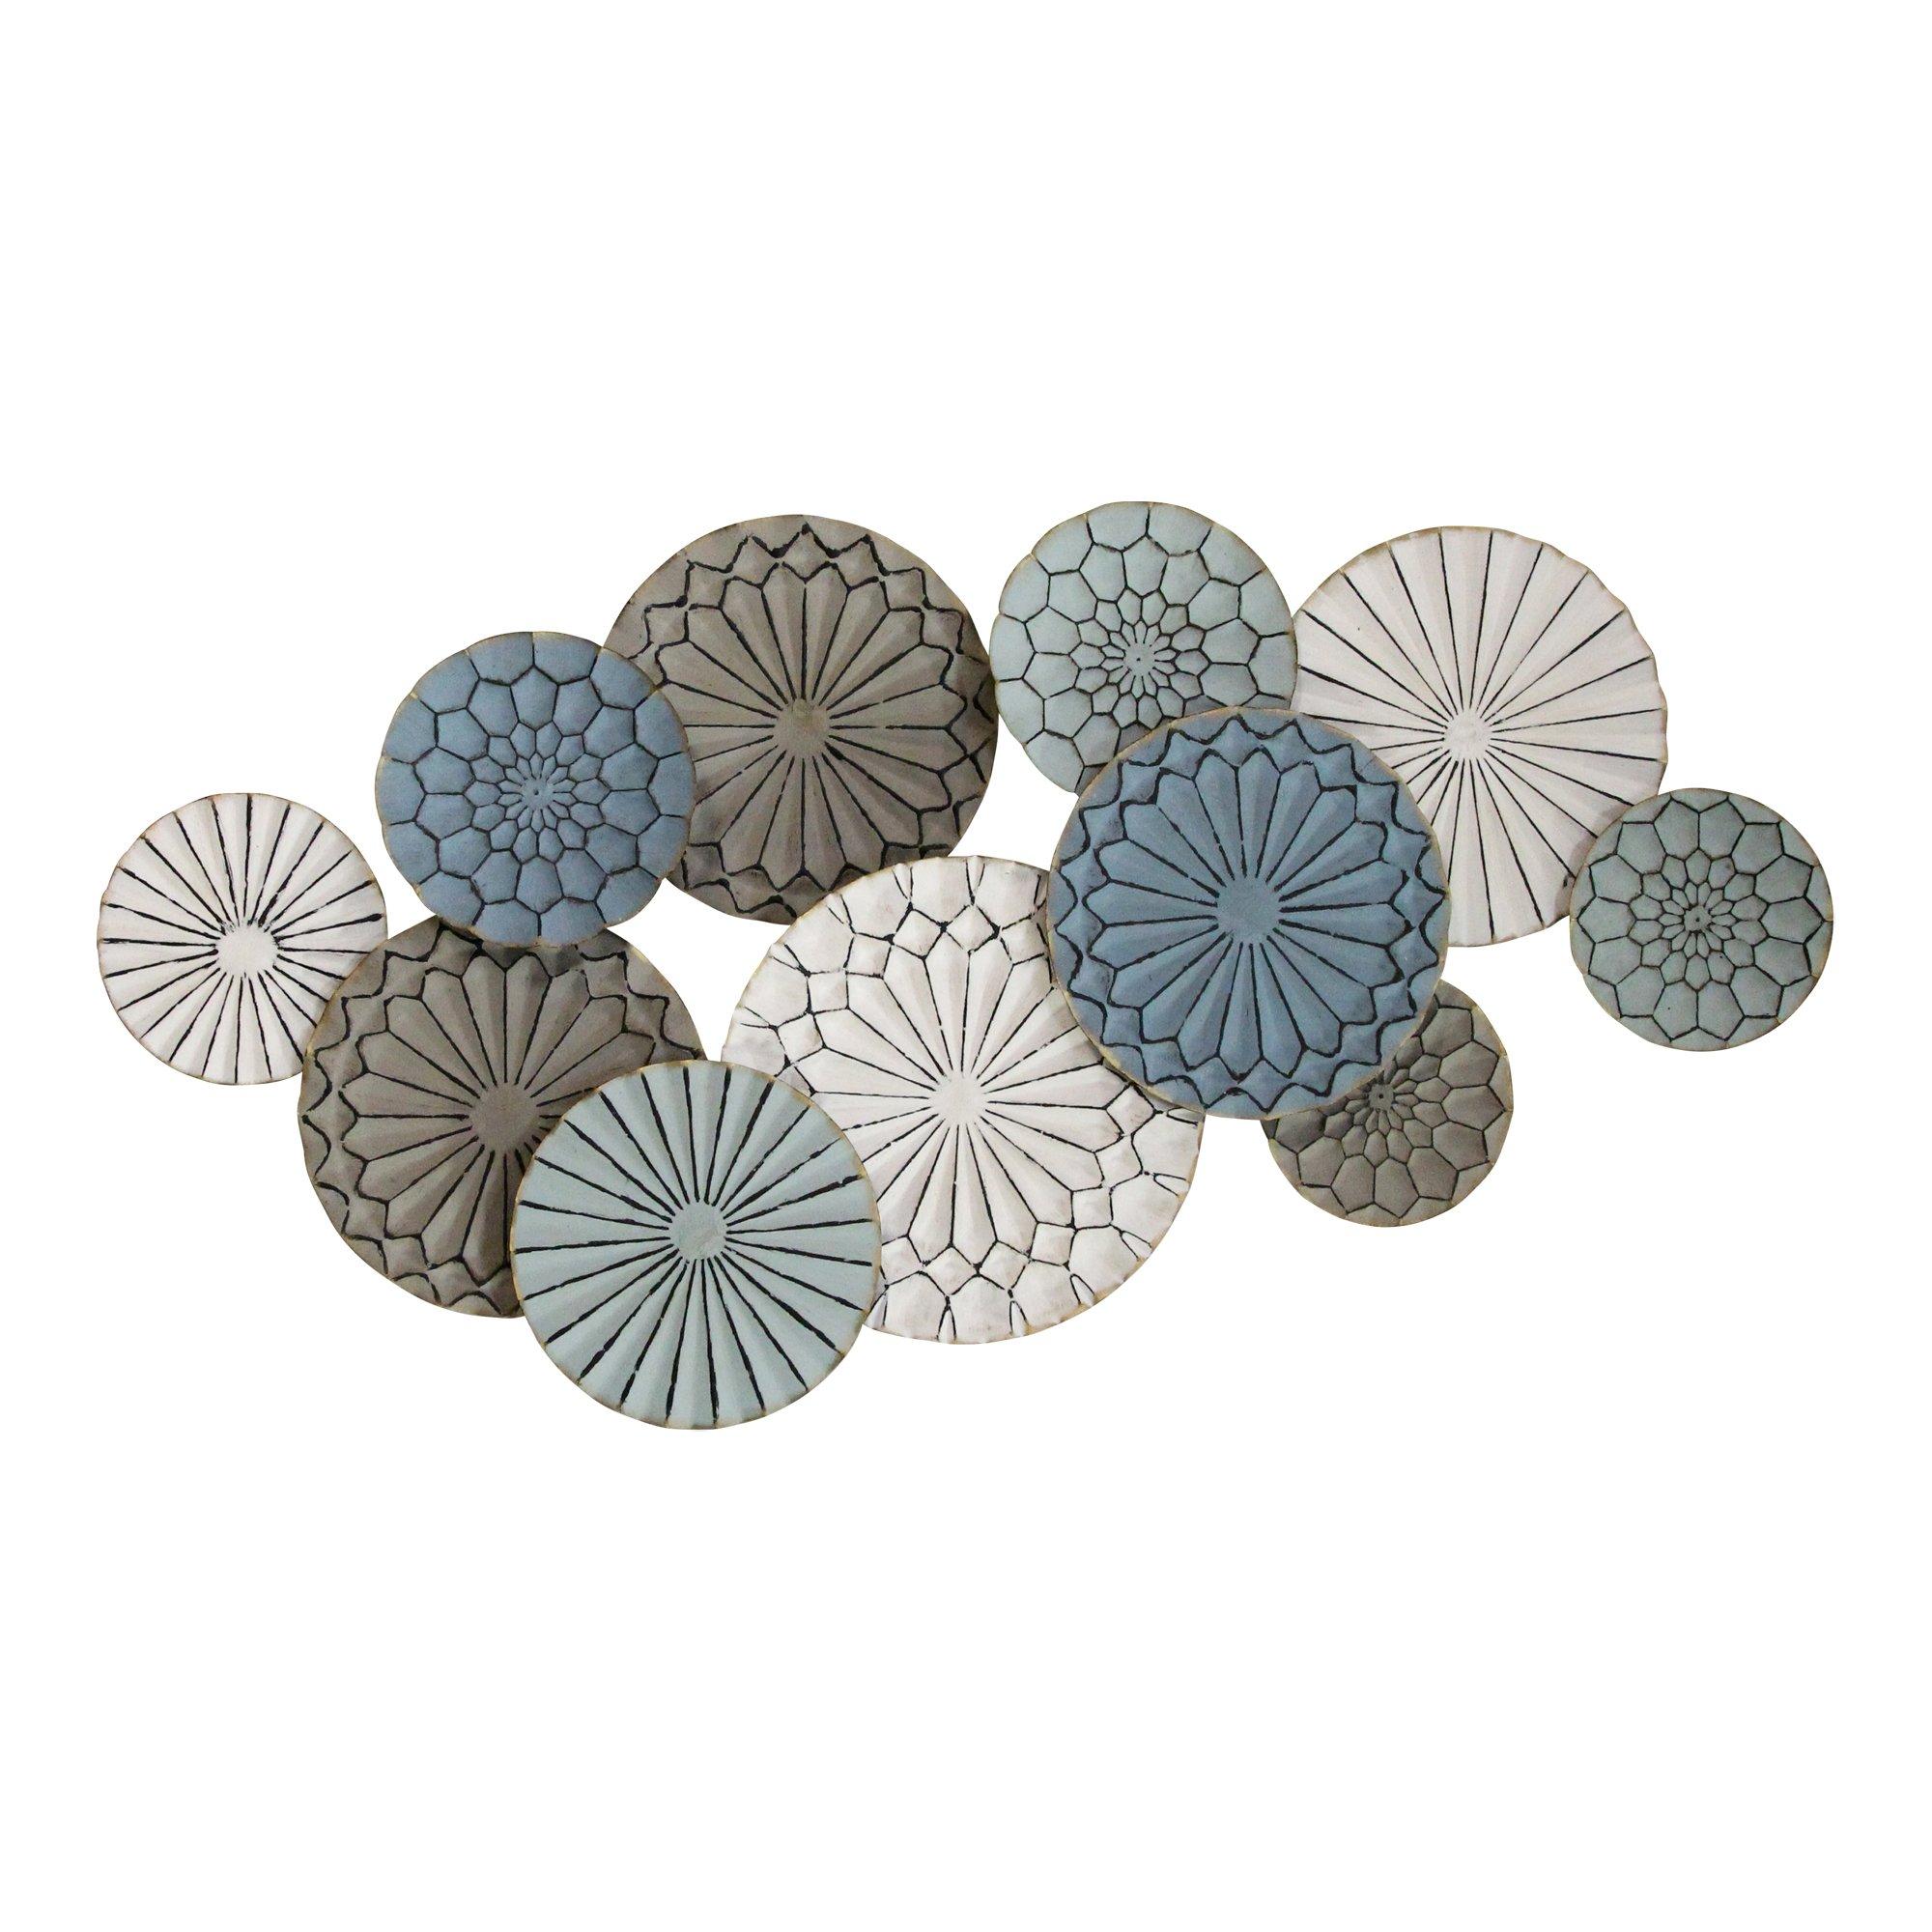 Boho-Inspired Metal Plates Wall Decor